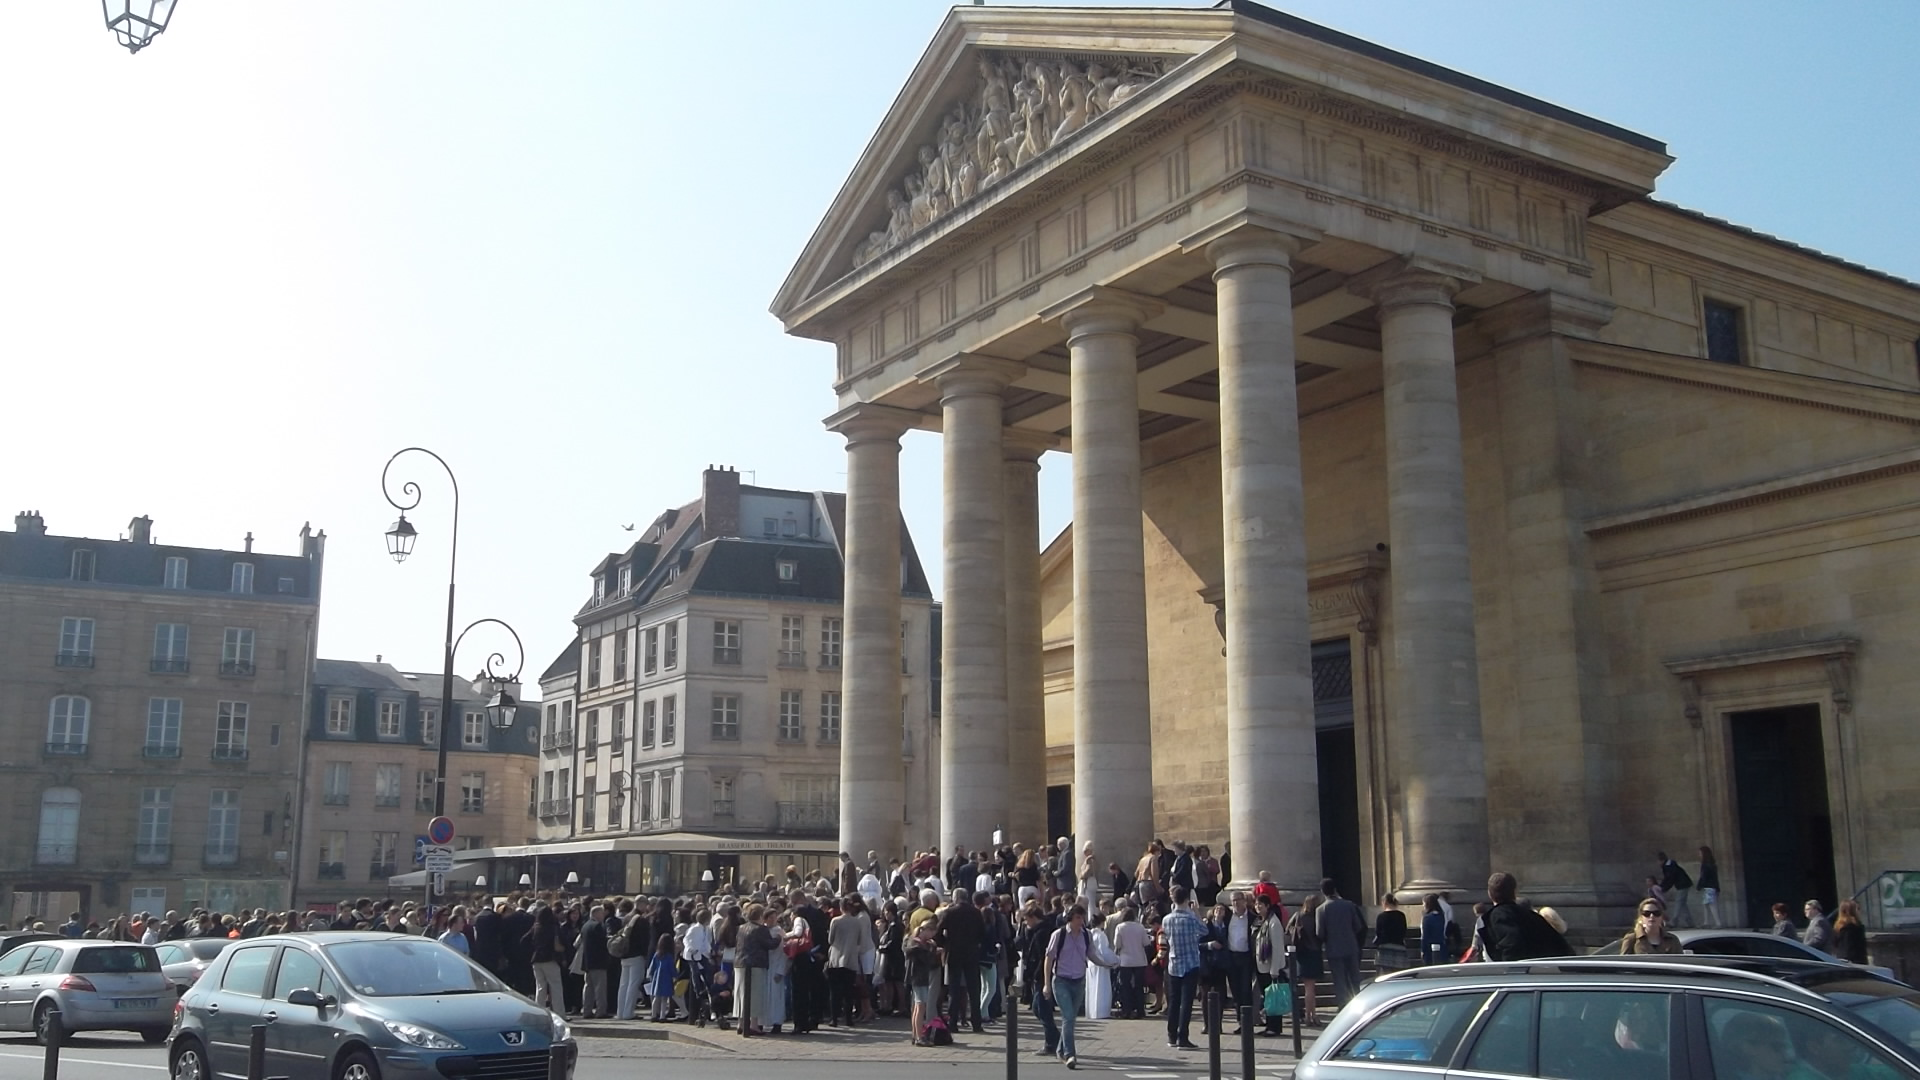 SGL-Eglise-St-Germain-pl-CDG-mar12